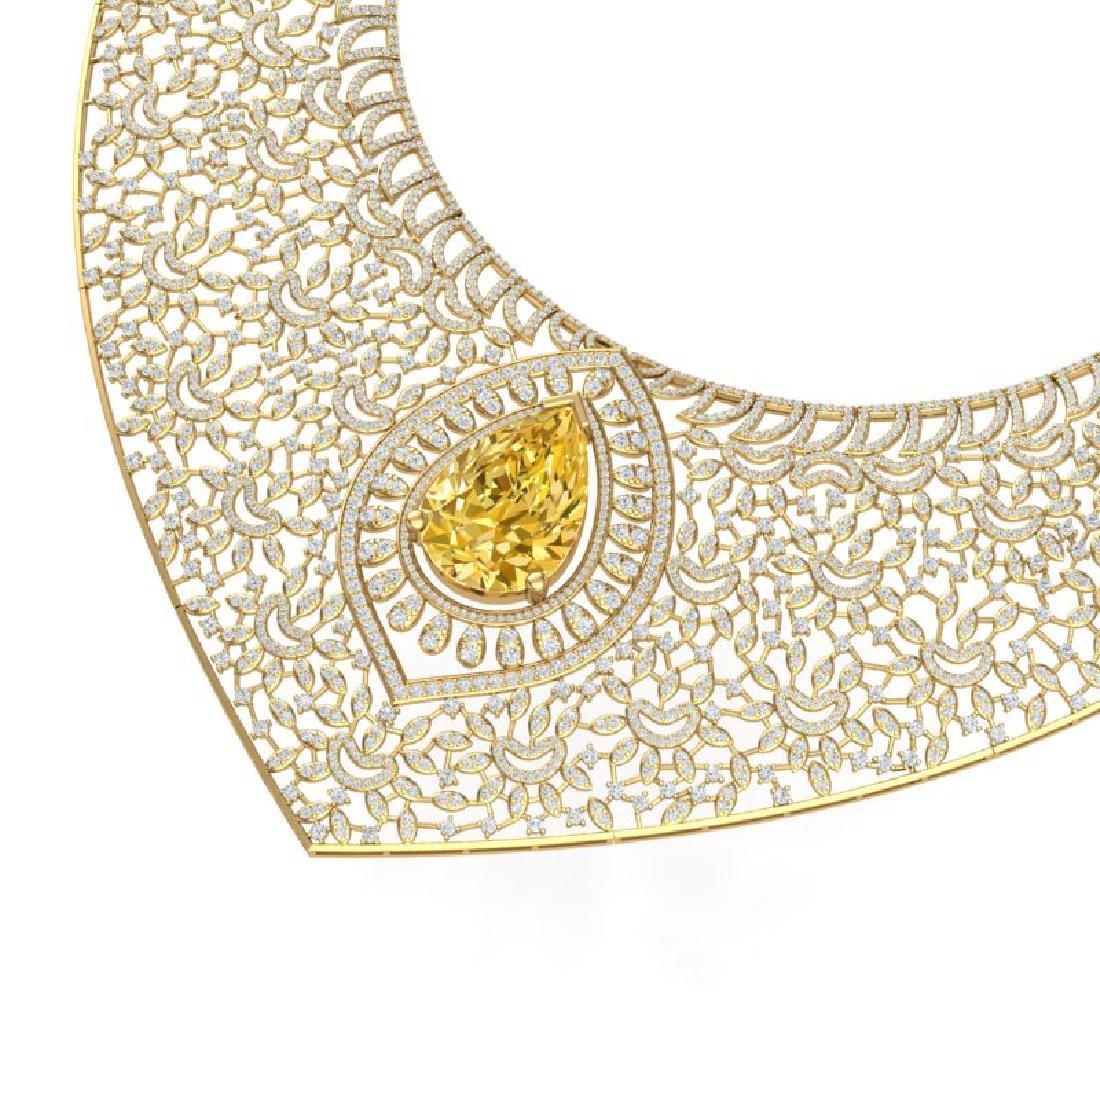 59.27 CTW Royalty Canary Citrine & VS Diamond Necklace